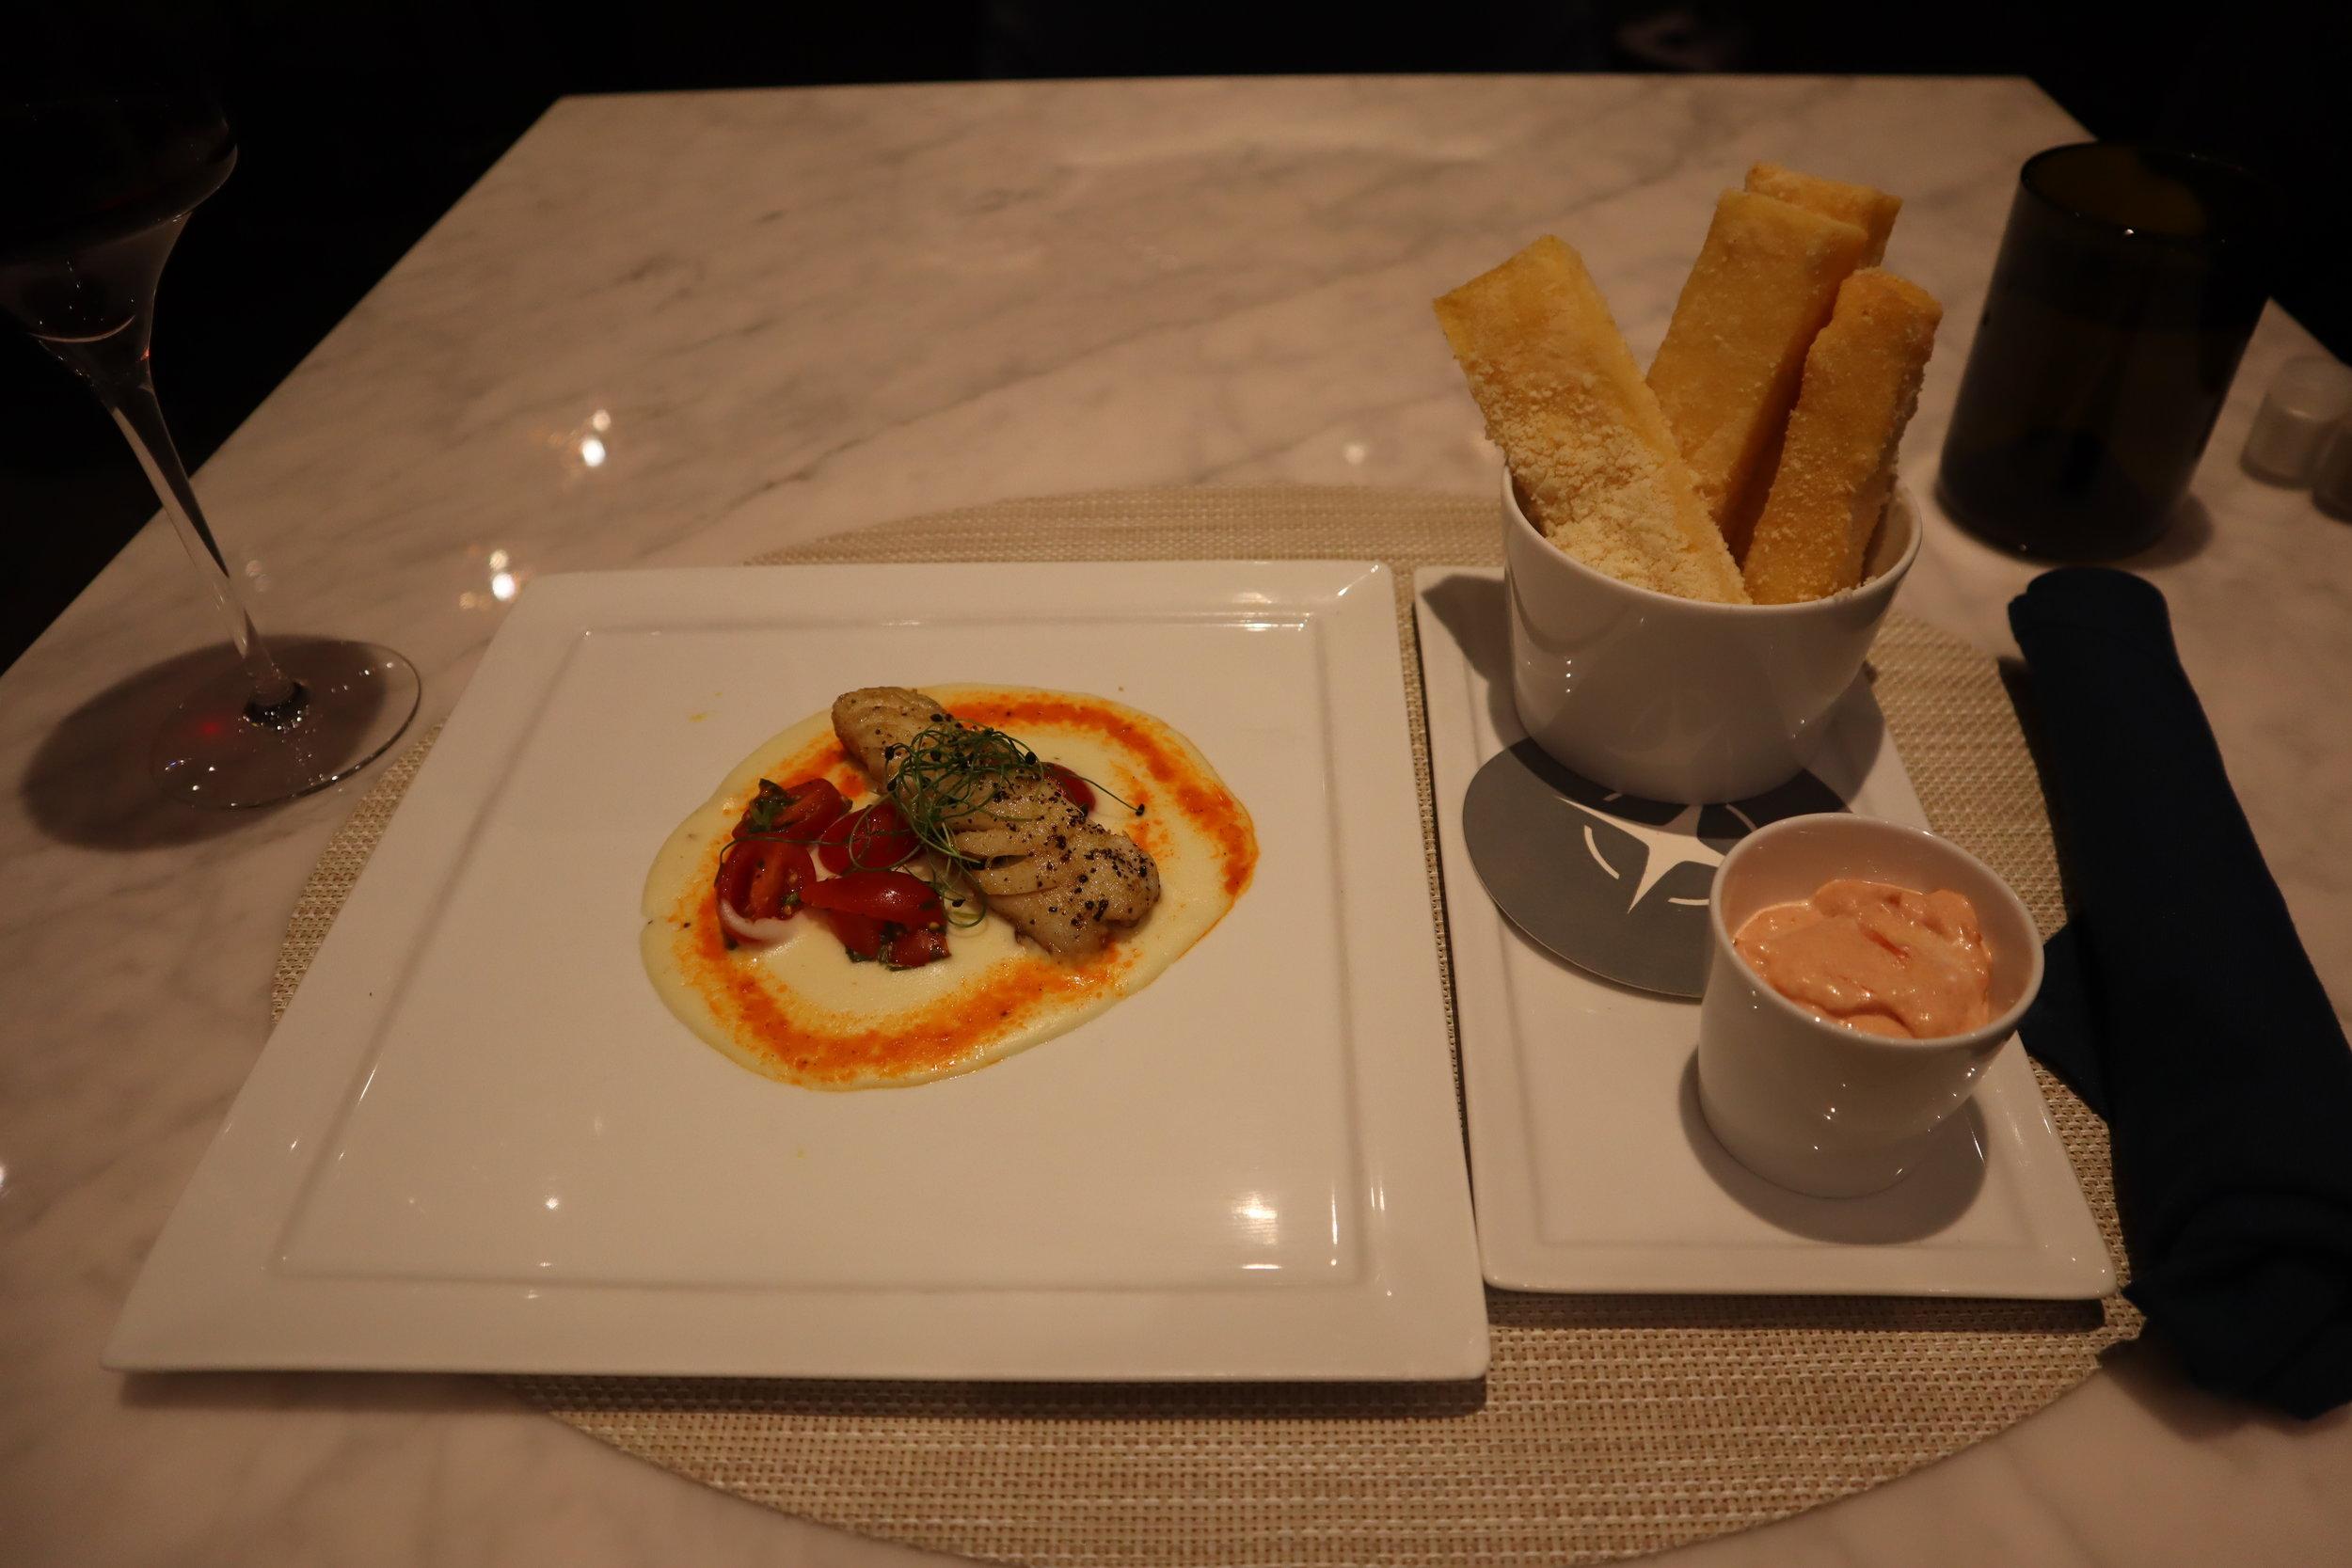 United Polaris Lounge Newark – Polenta fries and seared cod